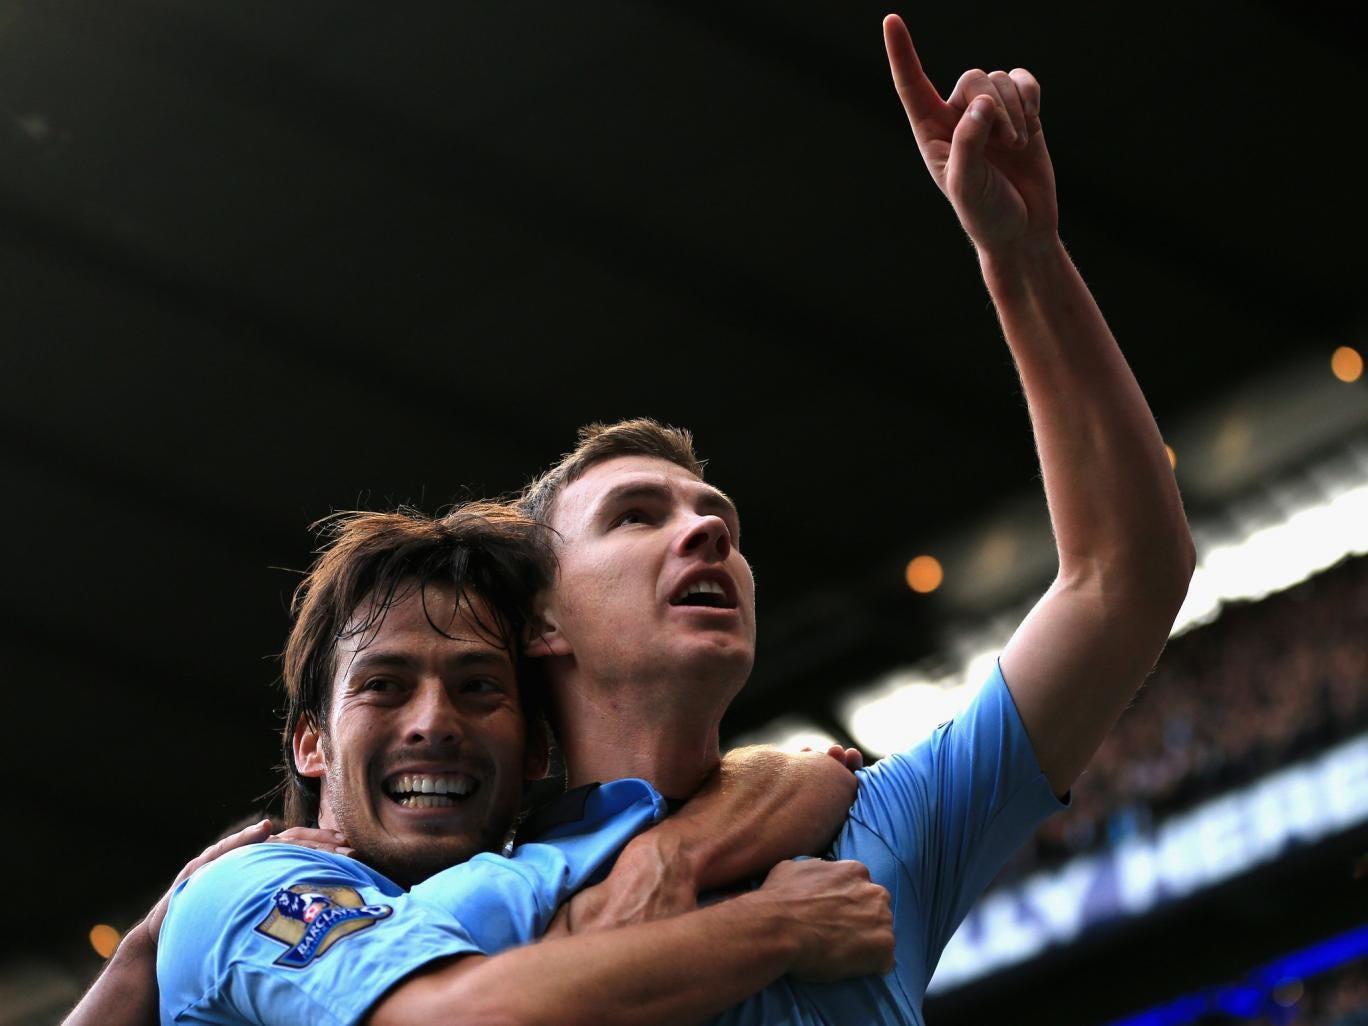 Manchester City's Edin Dzeko celebrates his goal against Spurs